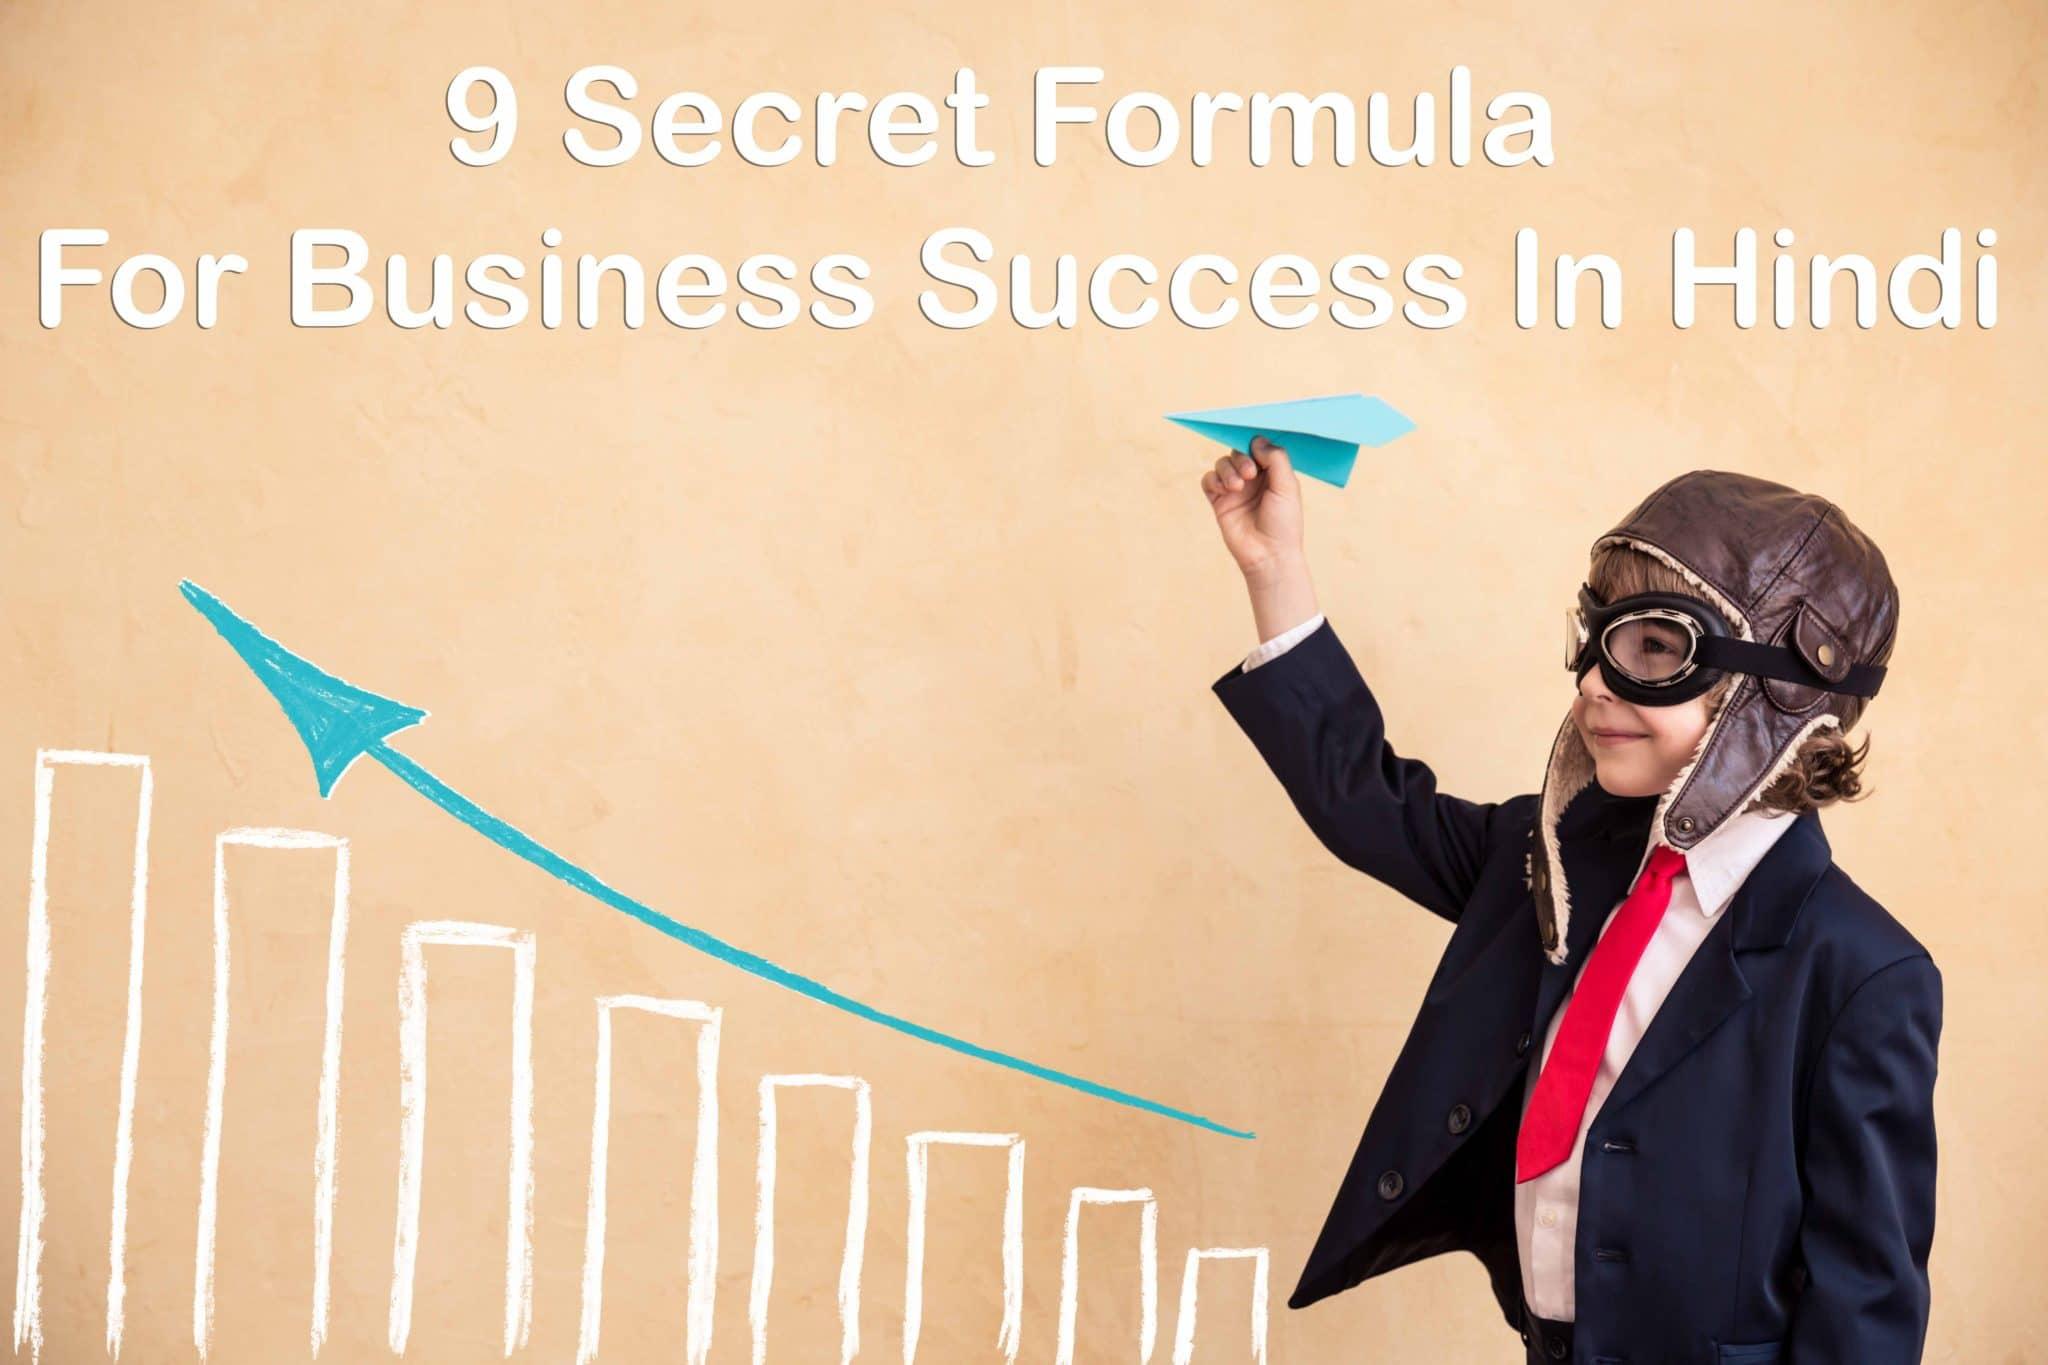 9 Secret Formula For Business Success In Hindi